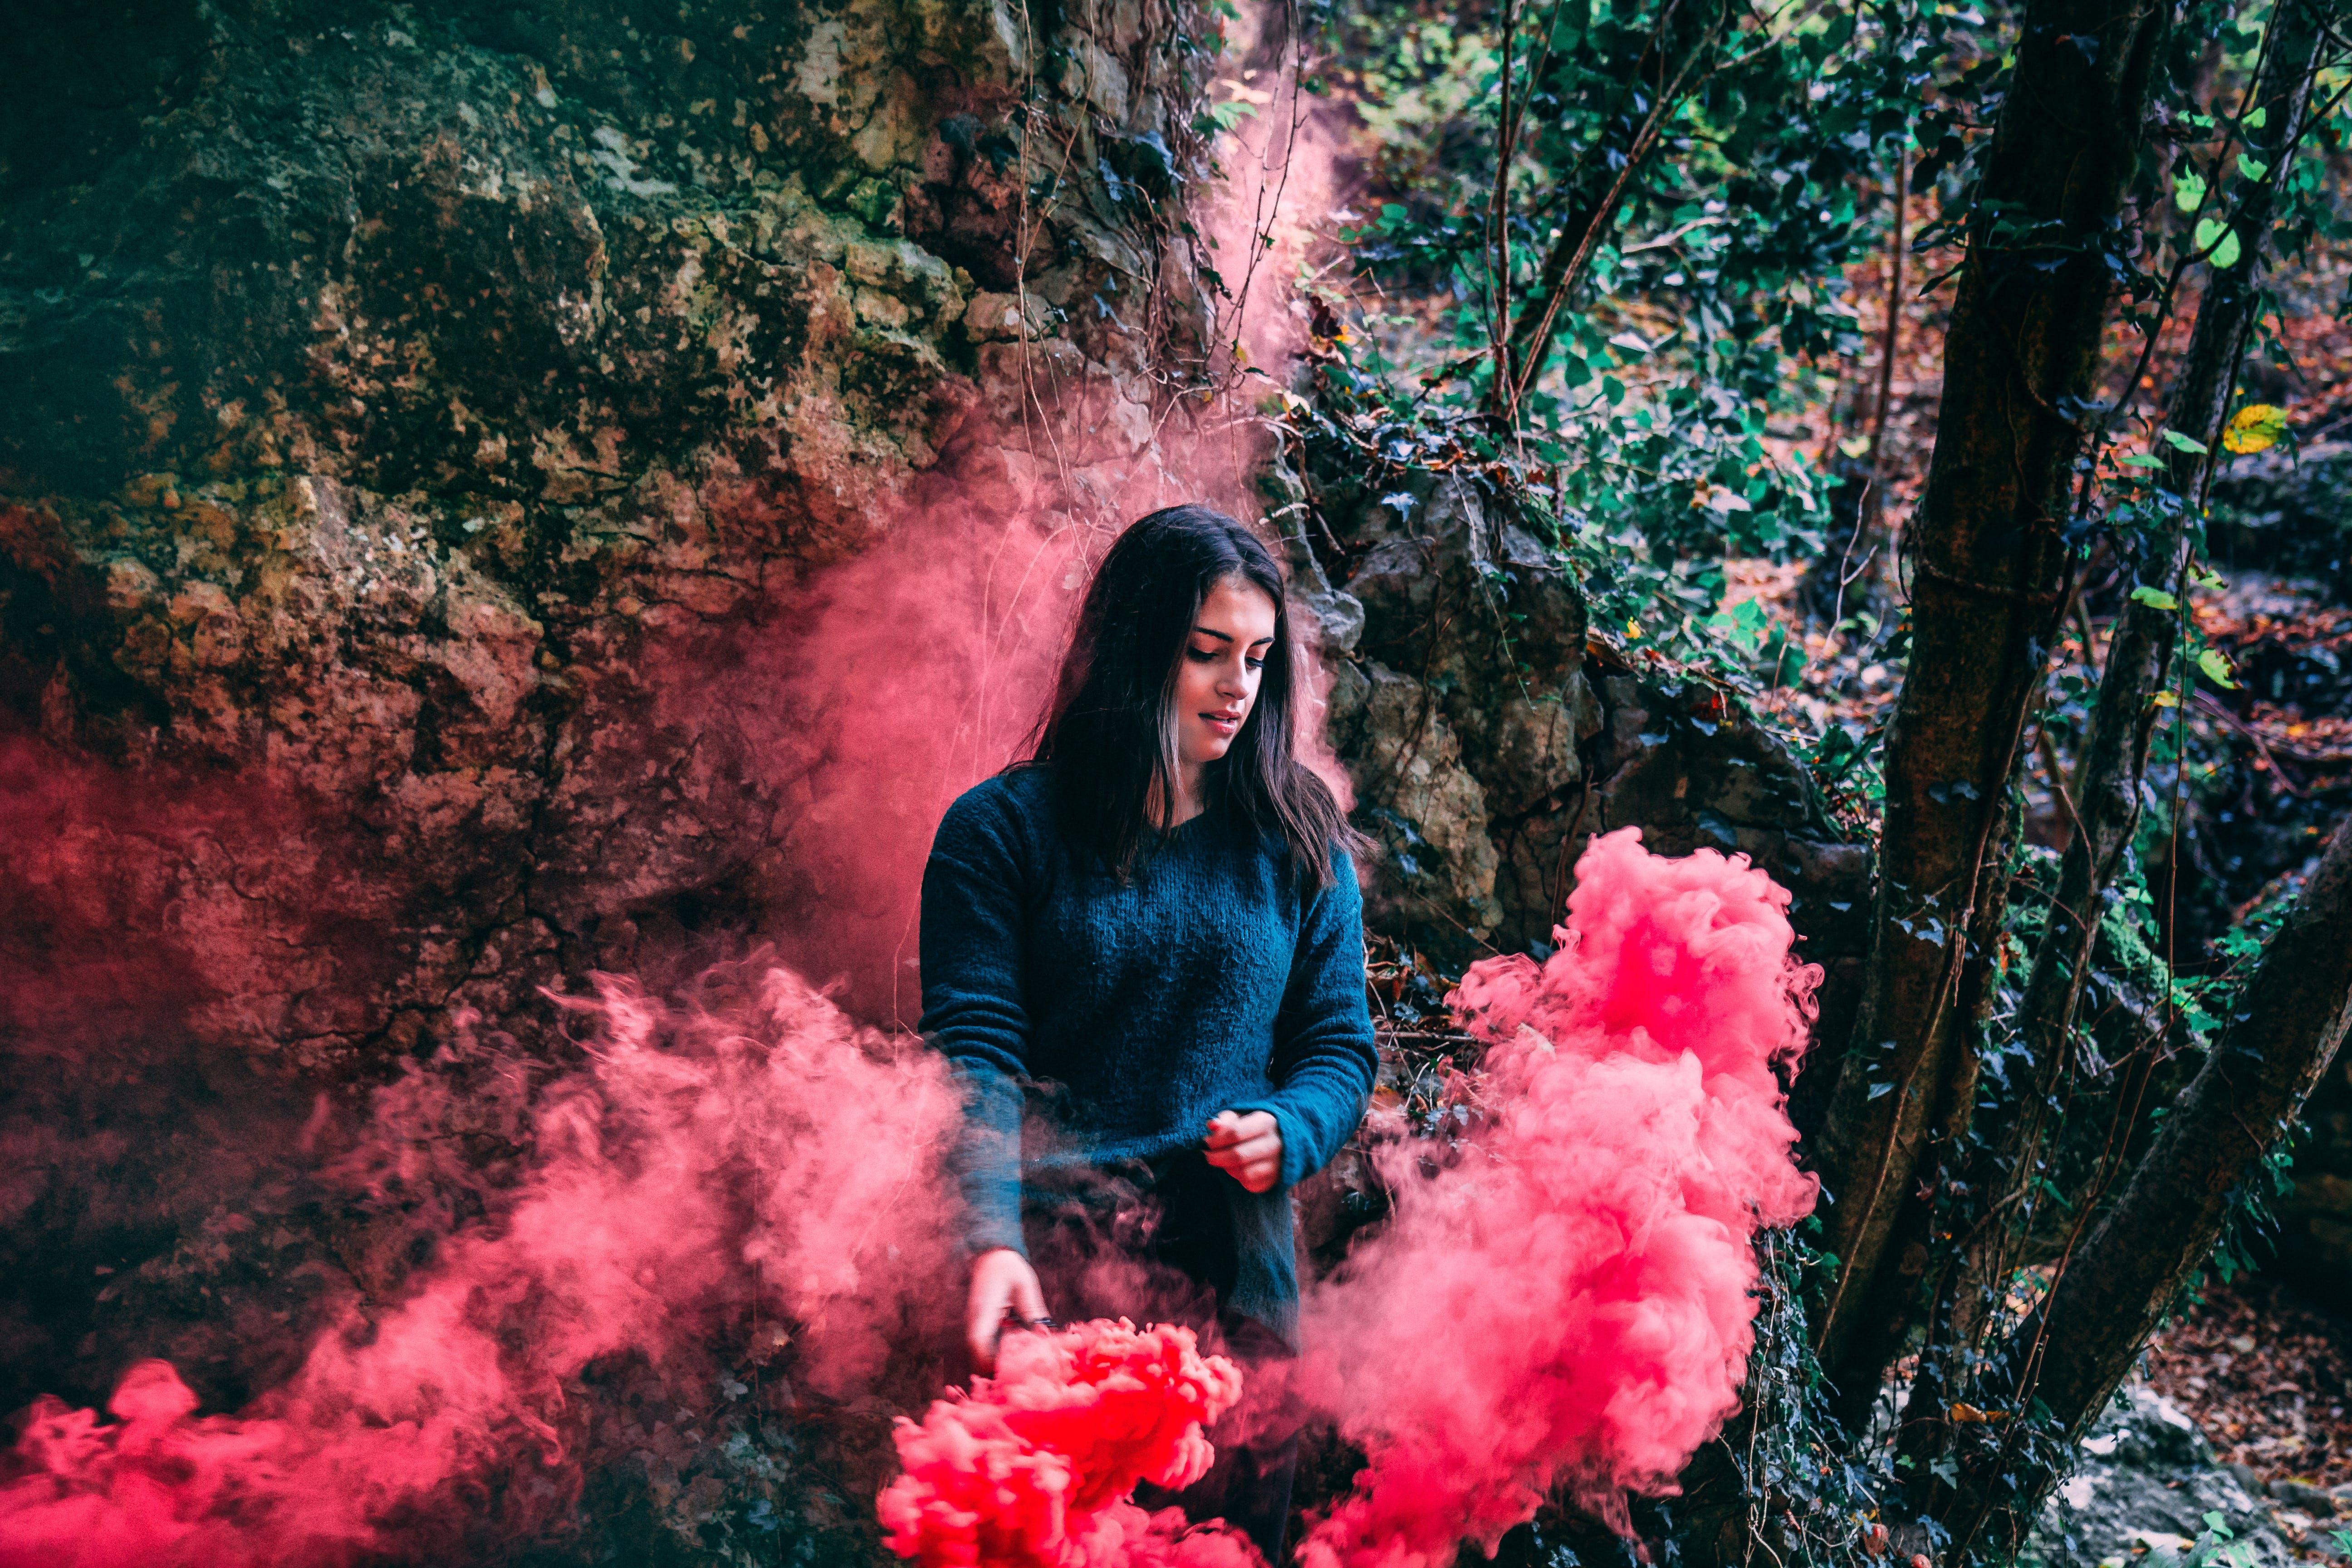 Woman Wearing Blue Long Sleeved Shirt Standing On Pink Smoke